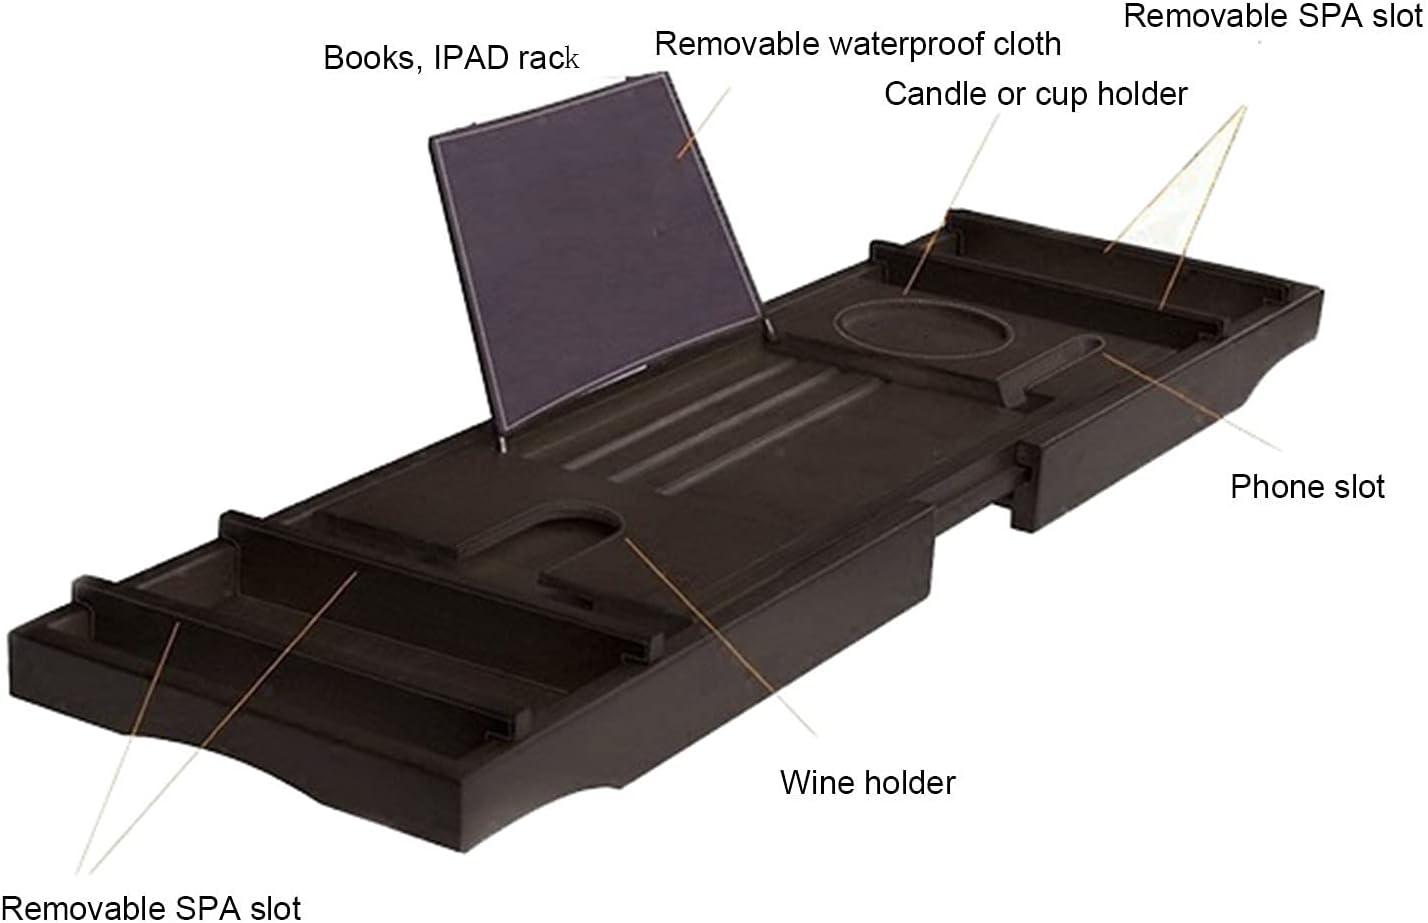 Extendable Bathtub Caddy Popular overseas Mail order Tray Ba Large Multifunctional Capacity